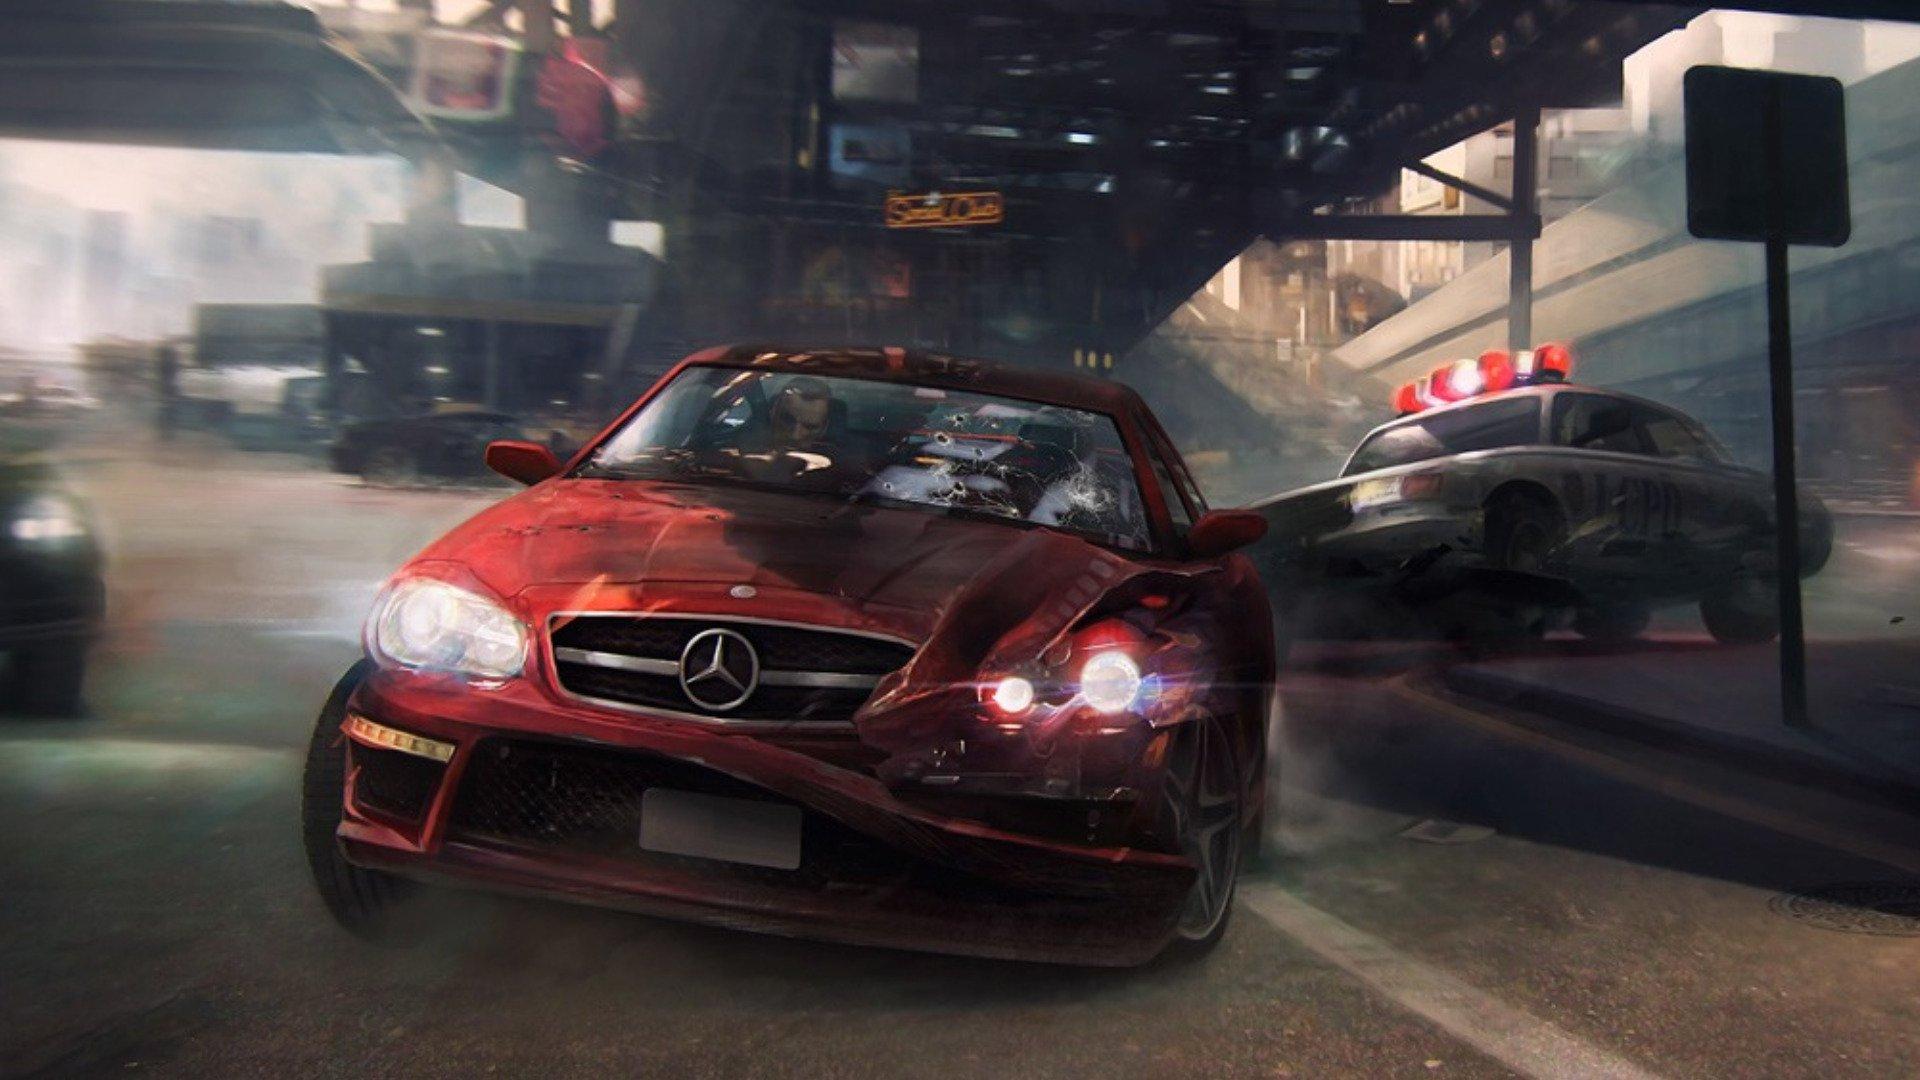 Grand Theft Auto V Full HD Fond d'écran and Arrière-Plan | 1920x1080 | ID:309119